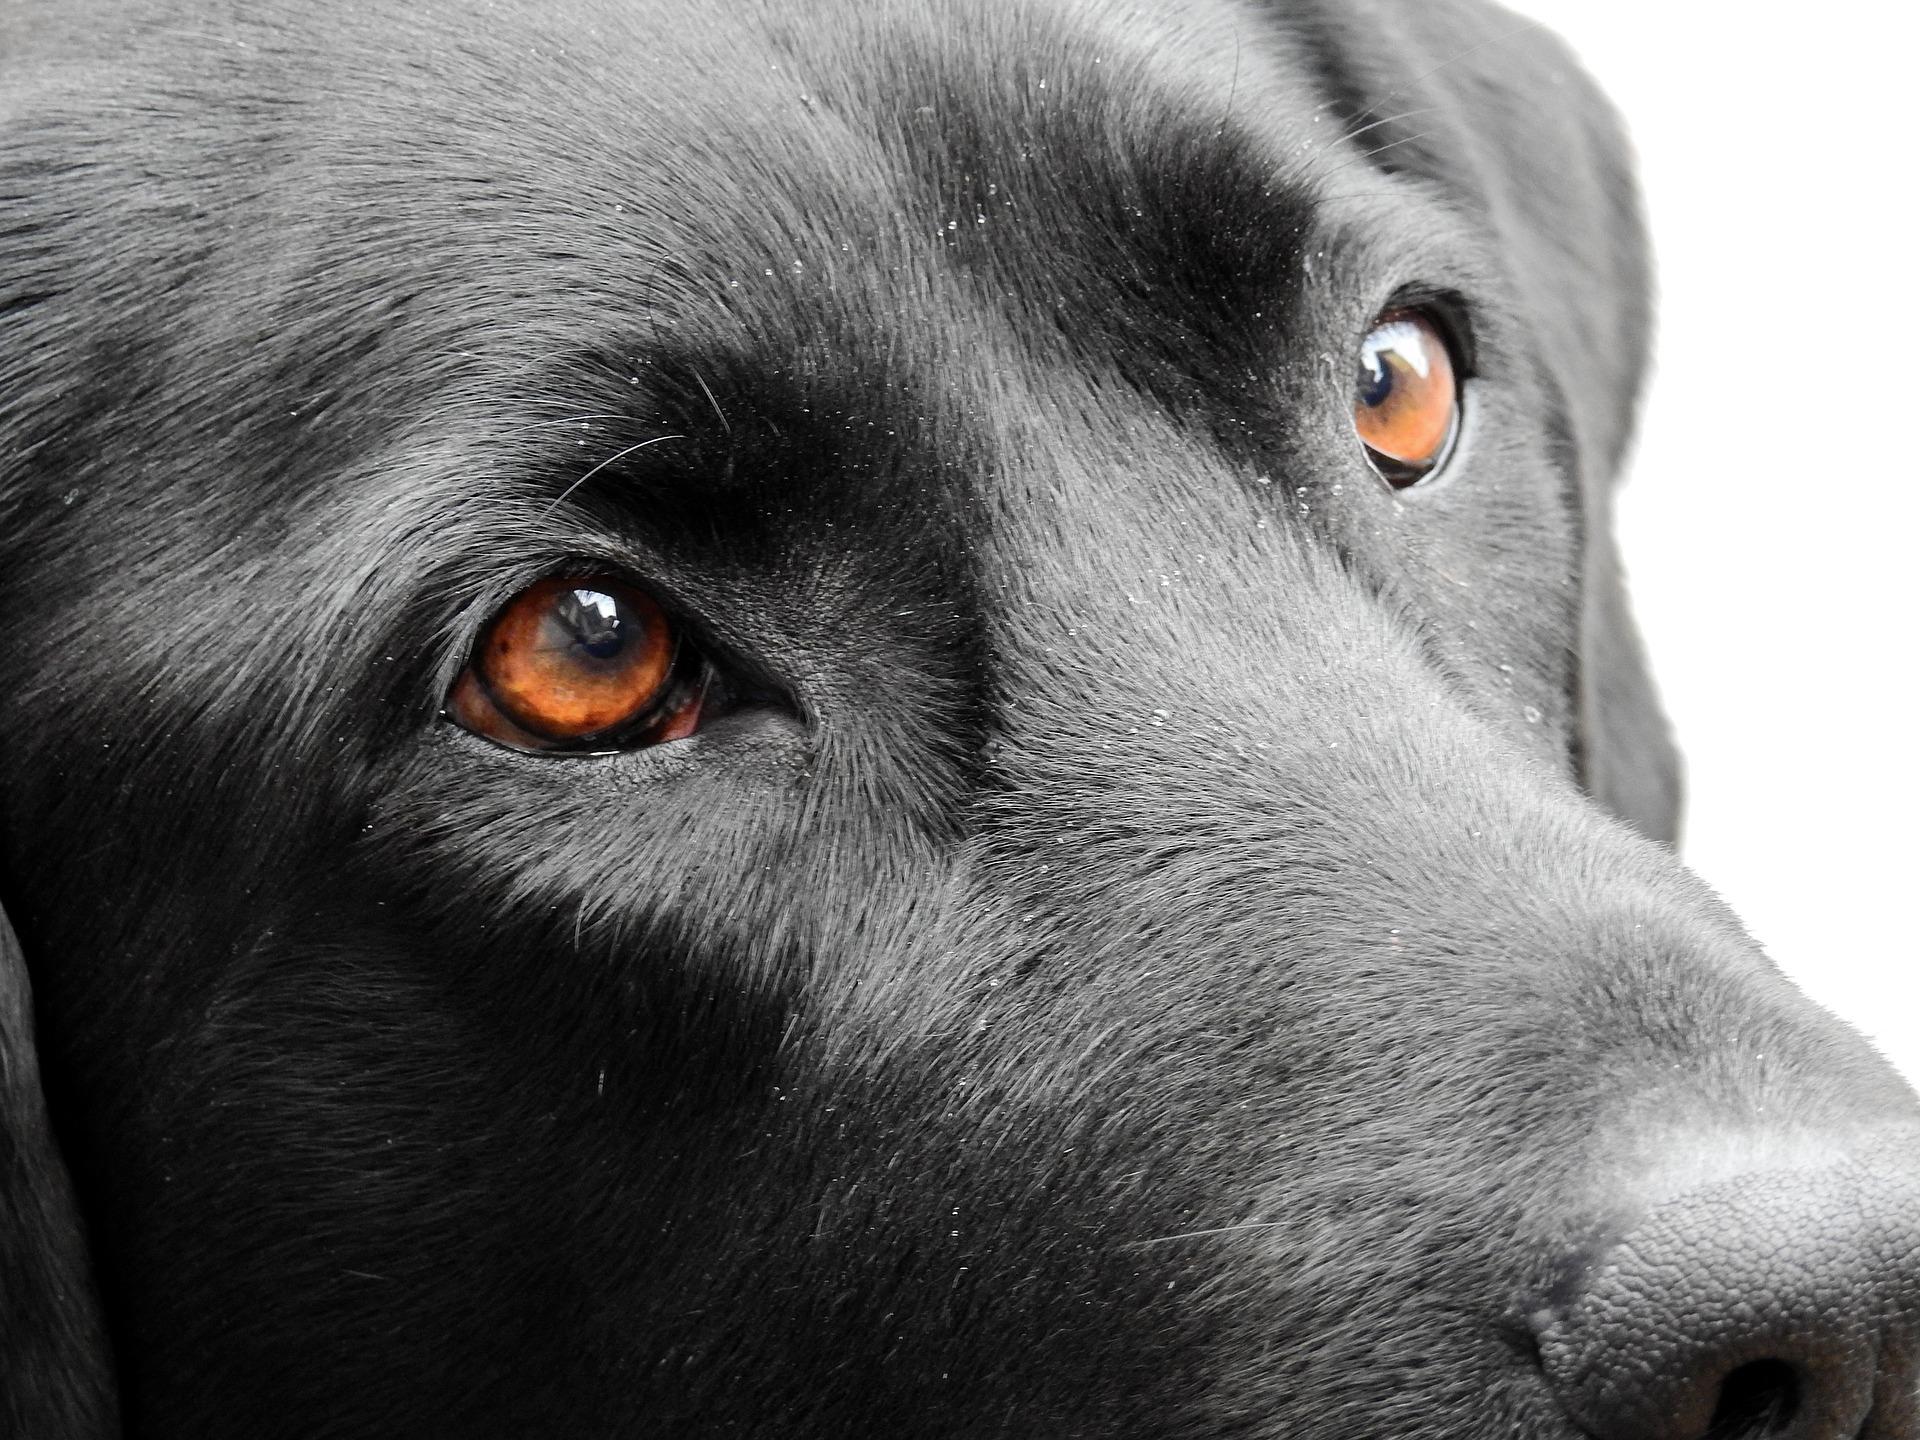 dog-1733145_1920 - Copia.jpg